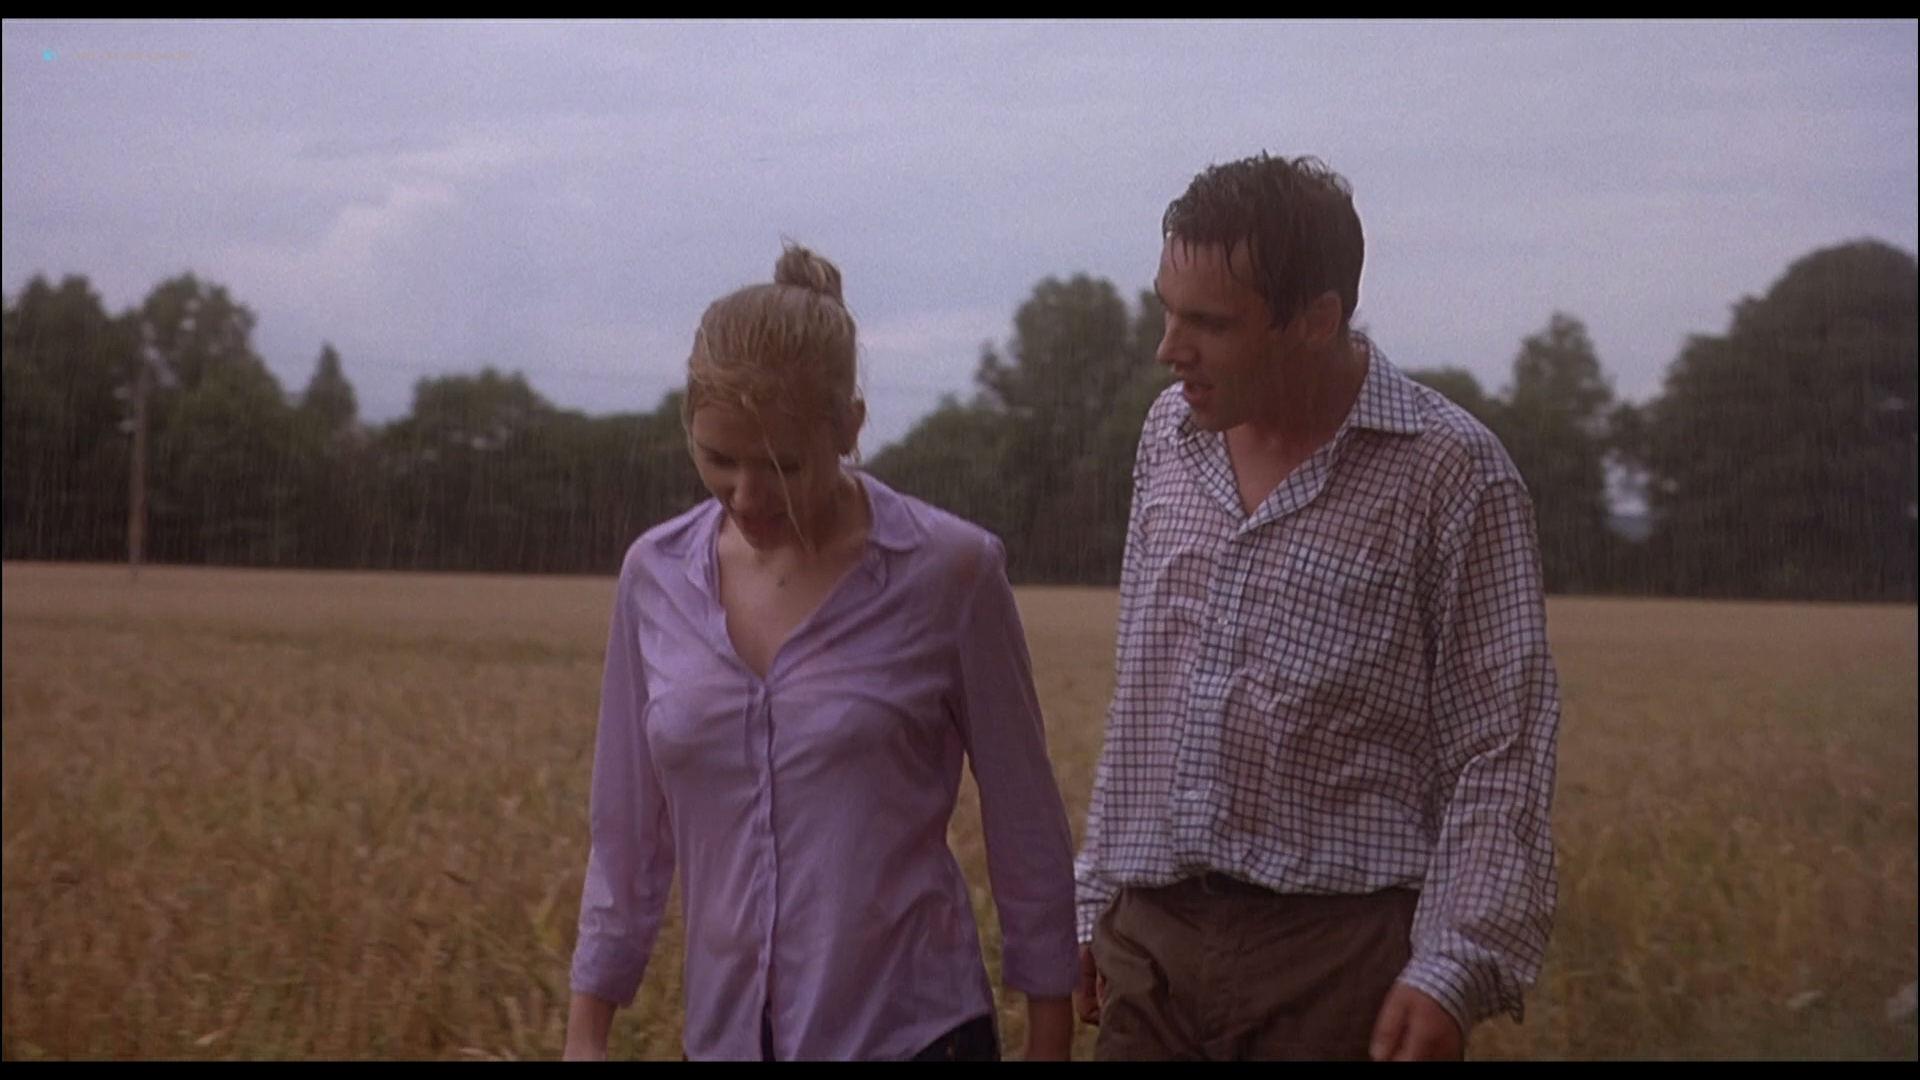 Scarlett Johansson see through and sex - Match Point (2005) HD 1080p BluRay (14)